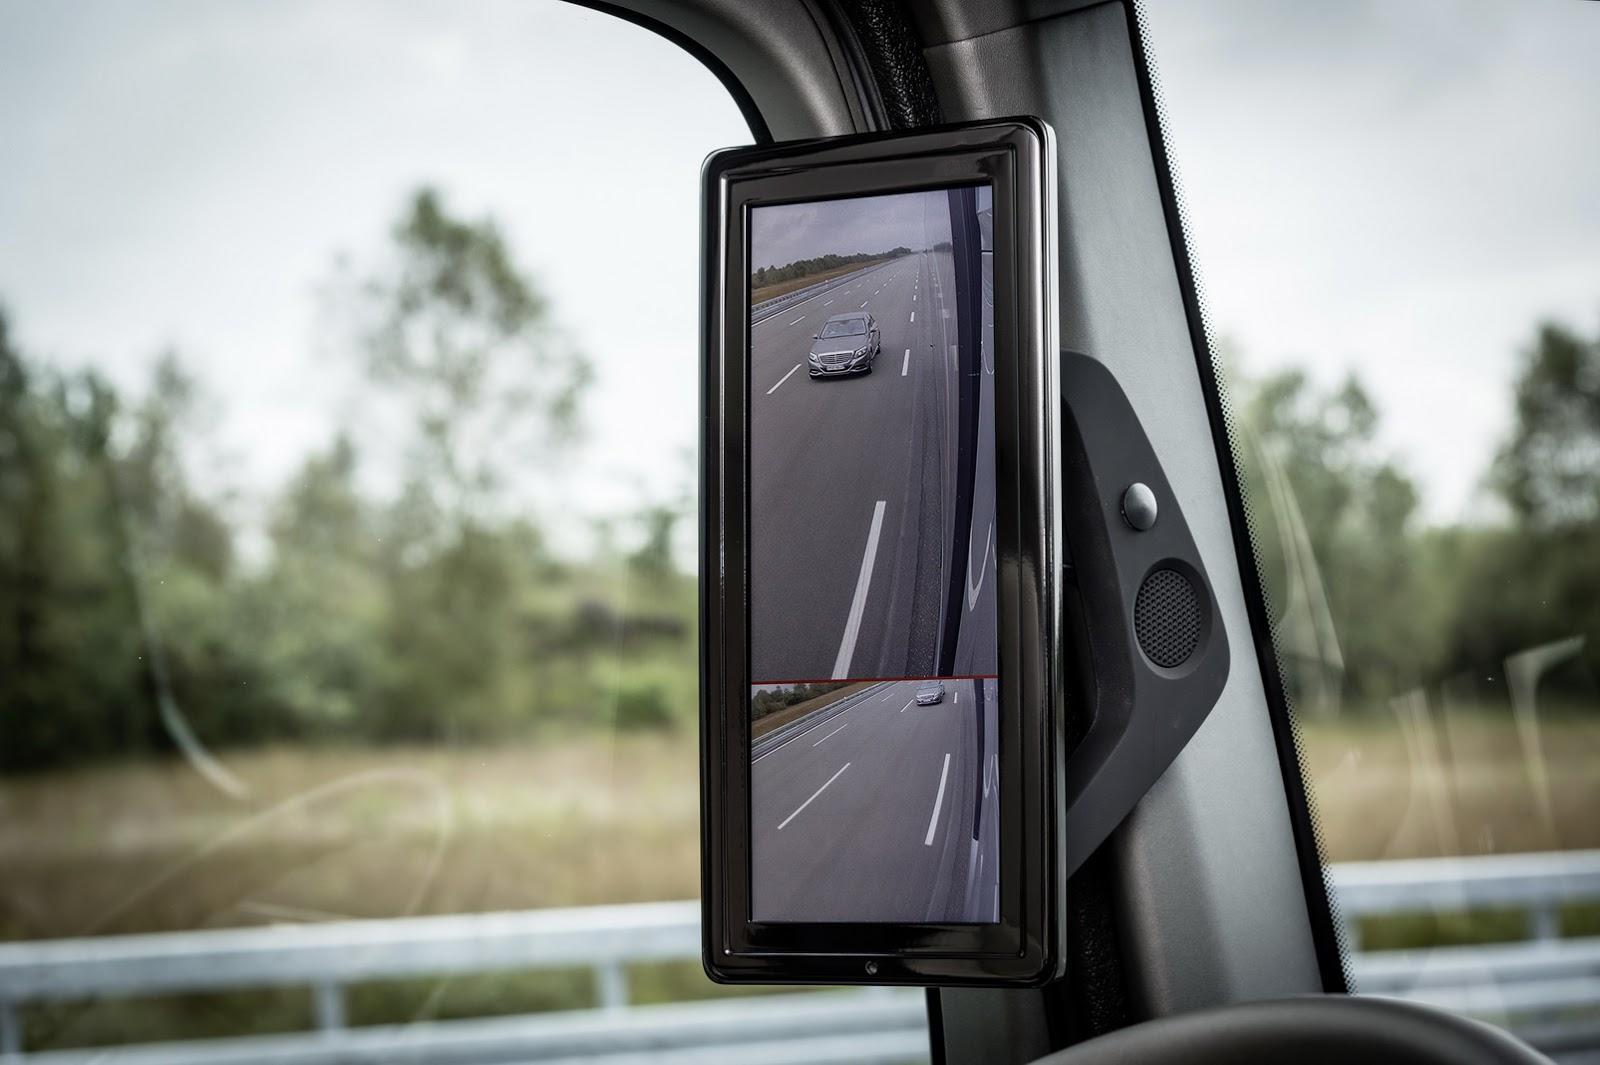 Mercedes-Future-Truck-2025-51